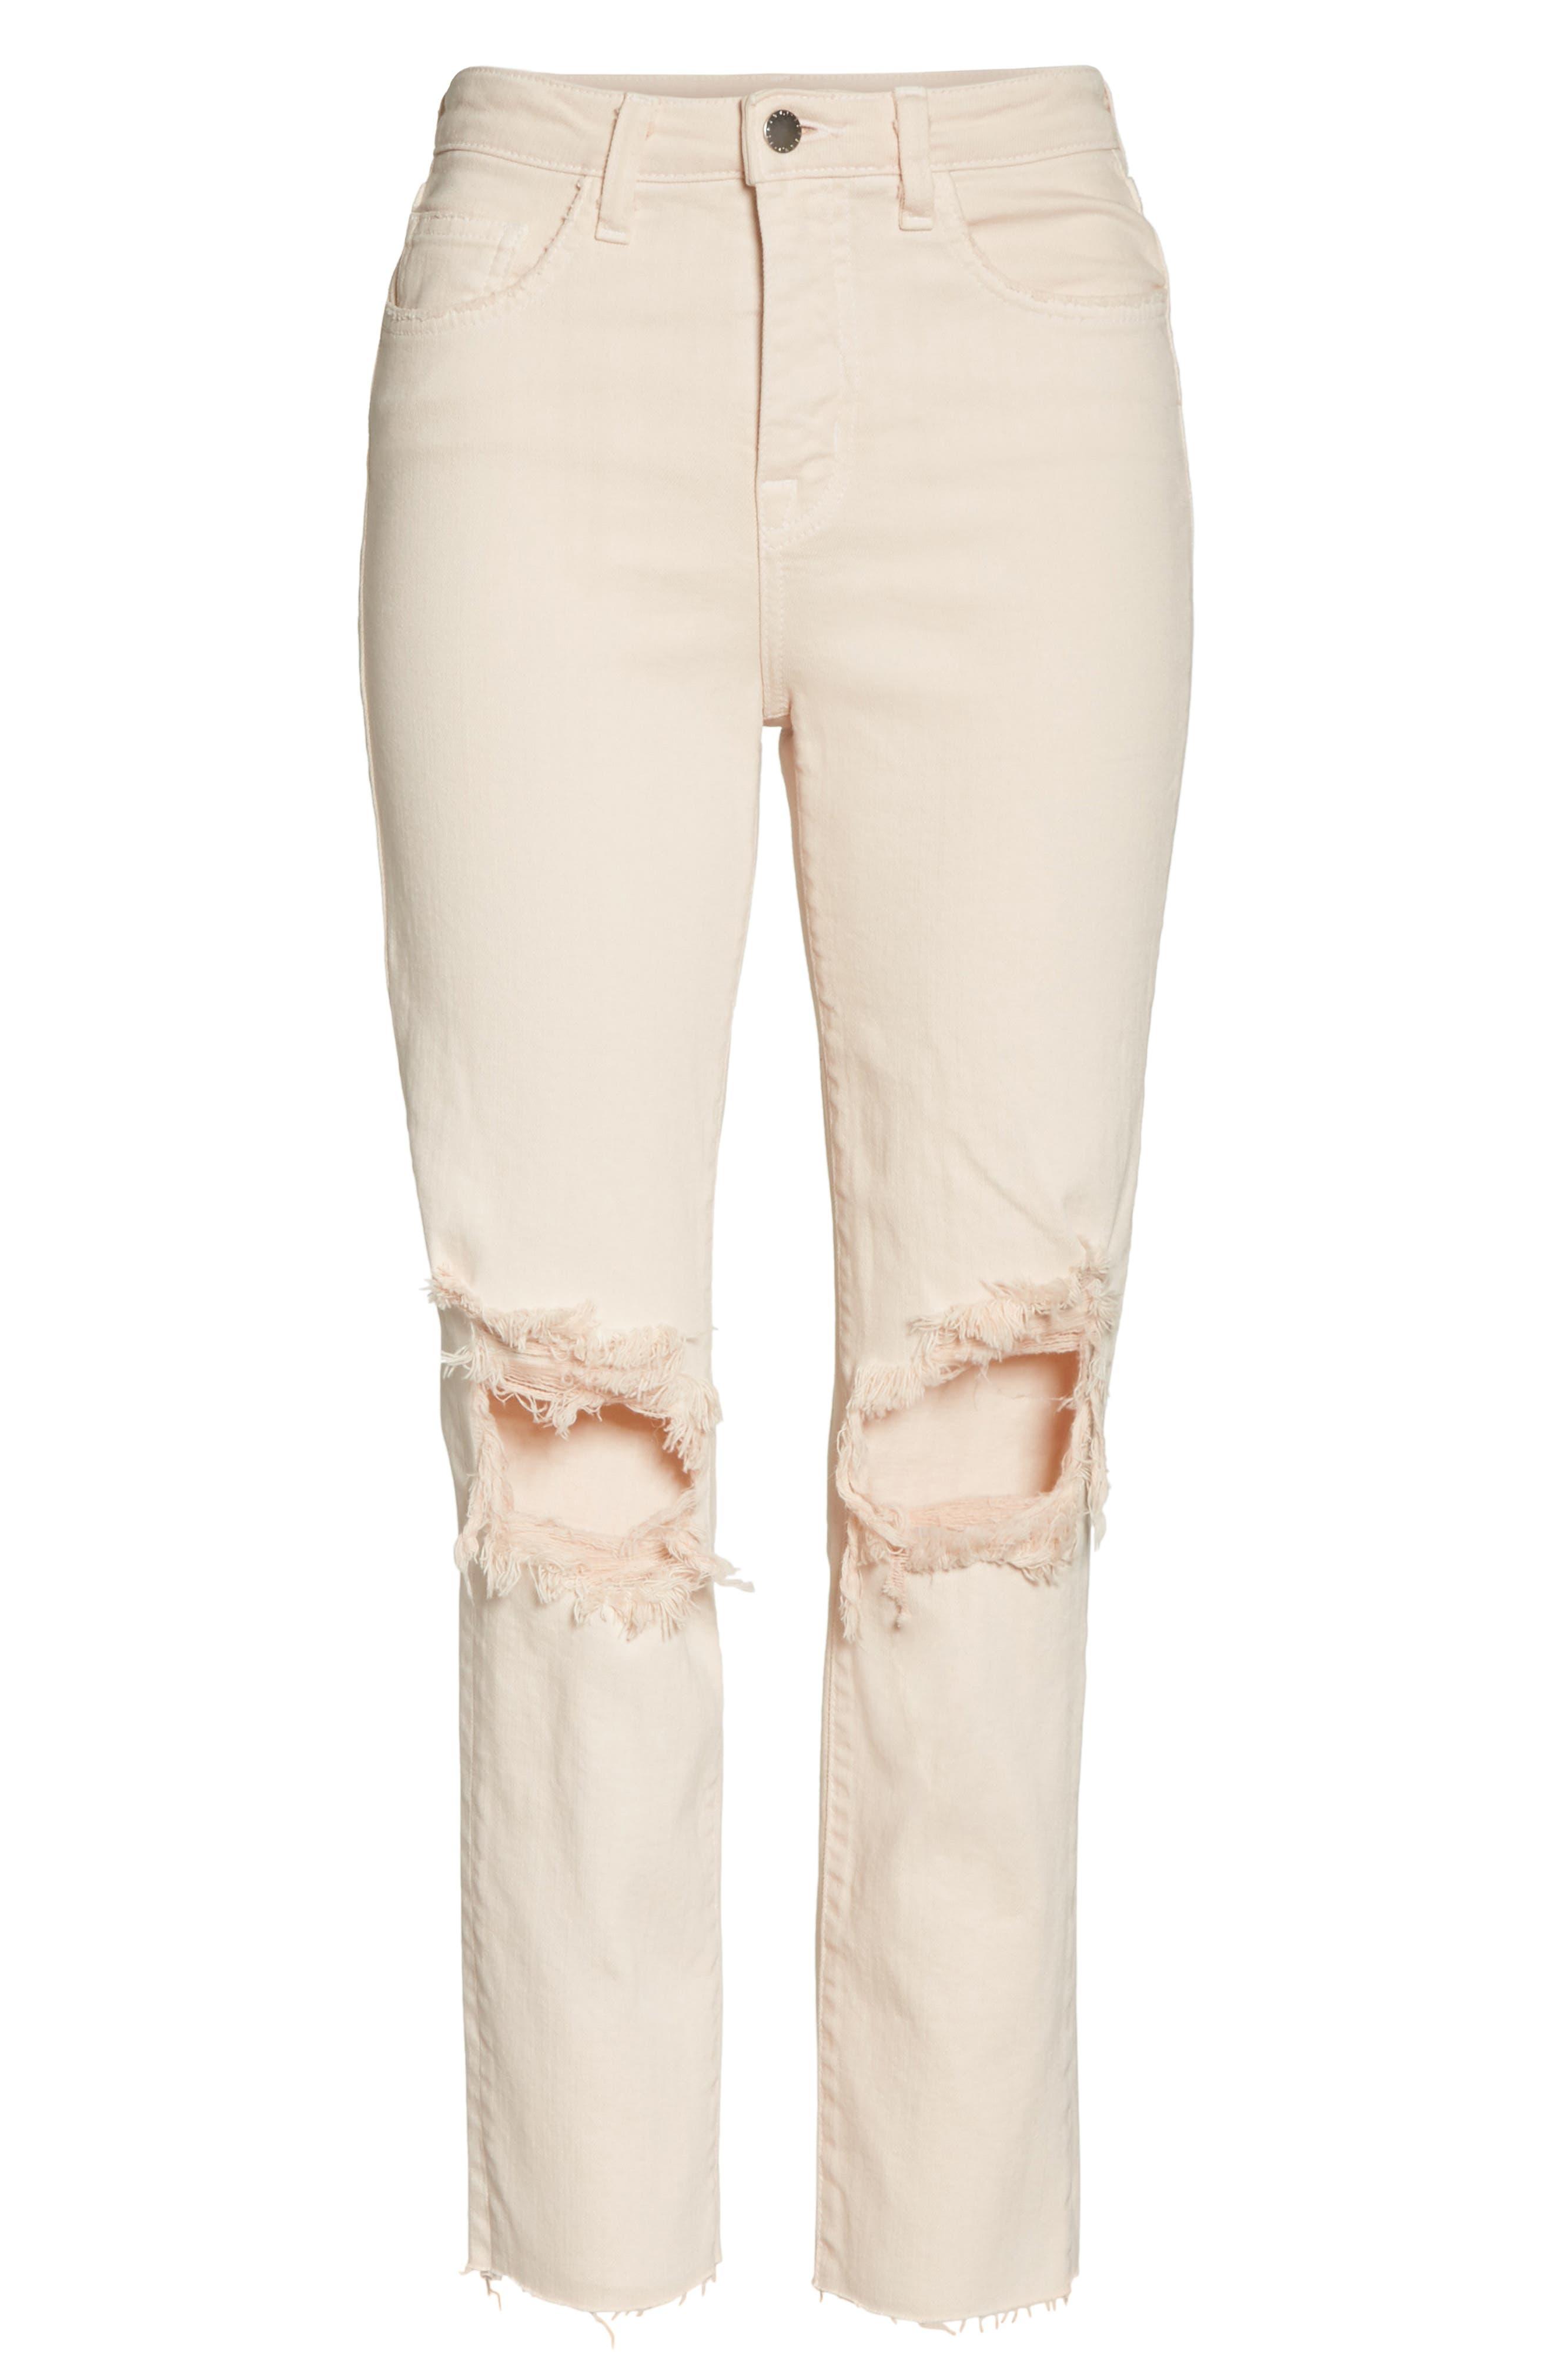 Audrina Ripped Straight Leg Crop Jeans,                             Alternate thumbnail 6, color,                             Quartz Worn Destruct